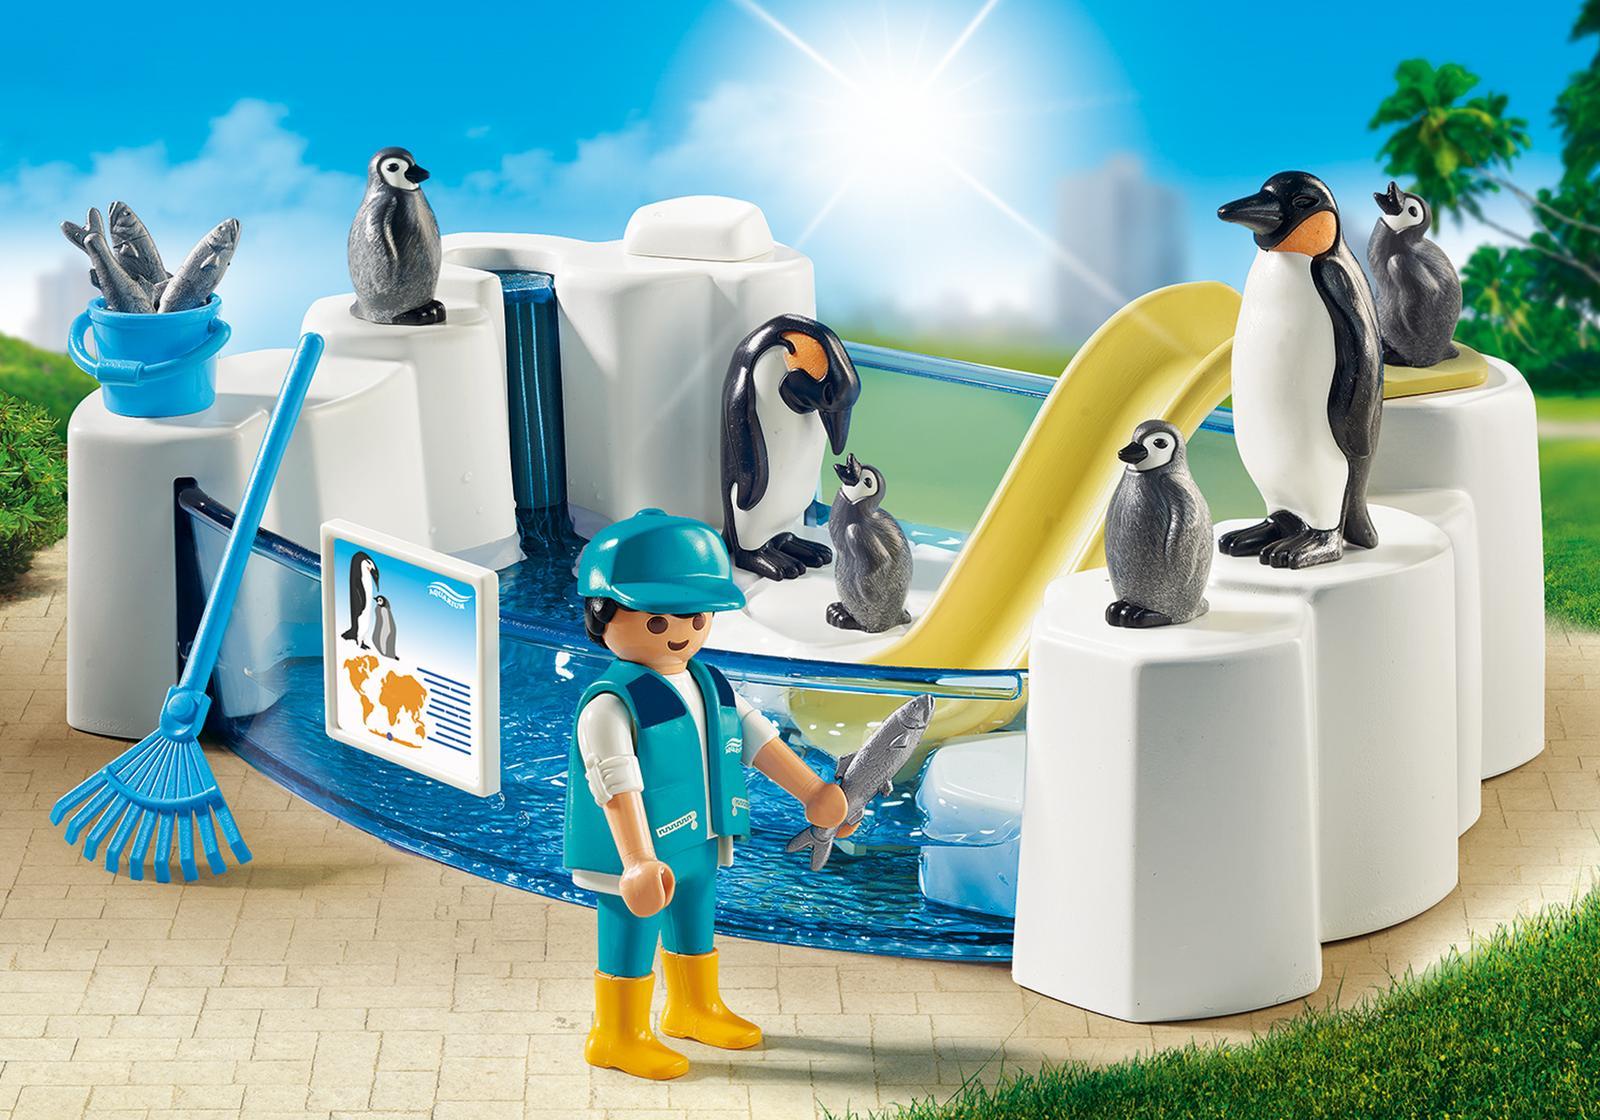 Tarcul-pinguinilor-PM9062-Playmobil-Family-Fun-1